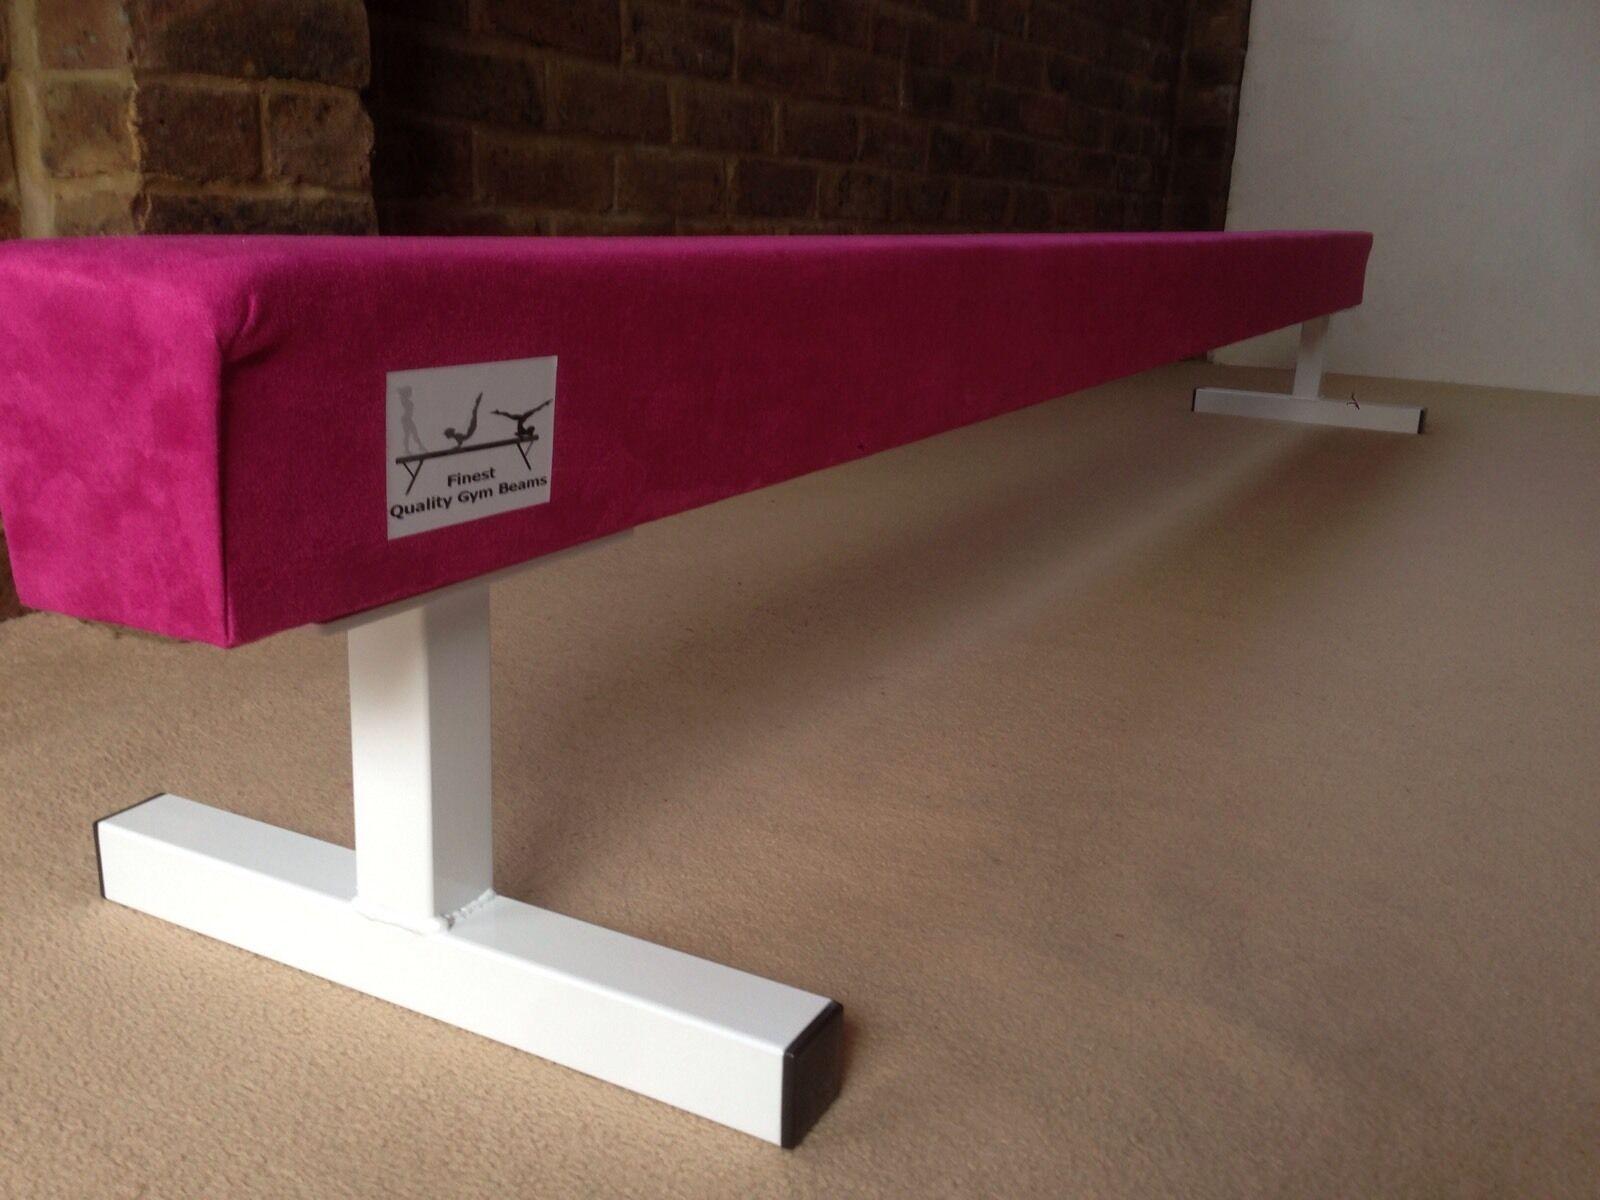 Finest quality gymnastics gym balance beam 10FT long 12  high choice of colours